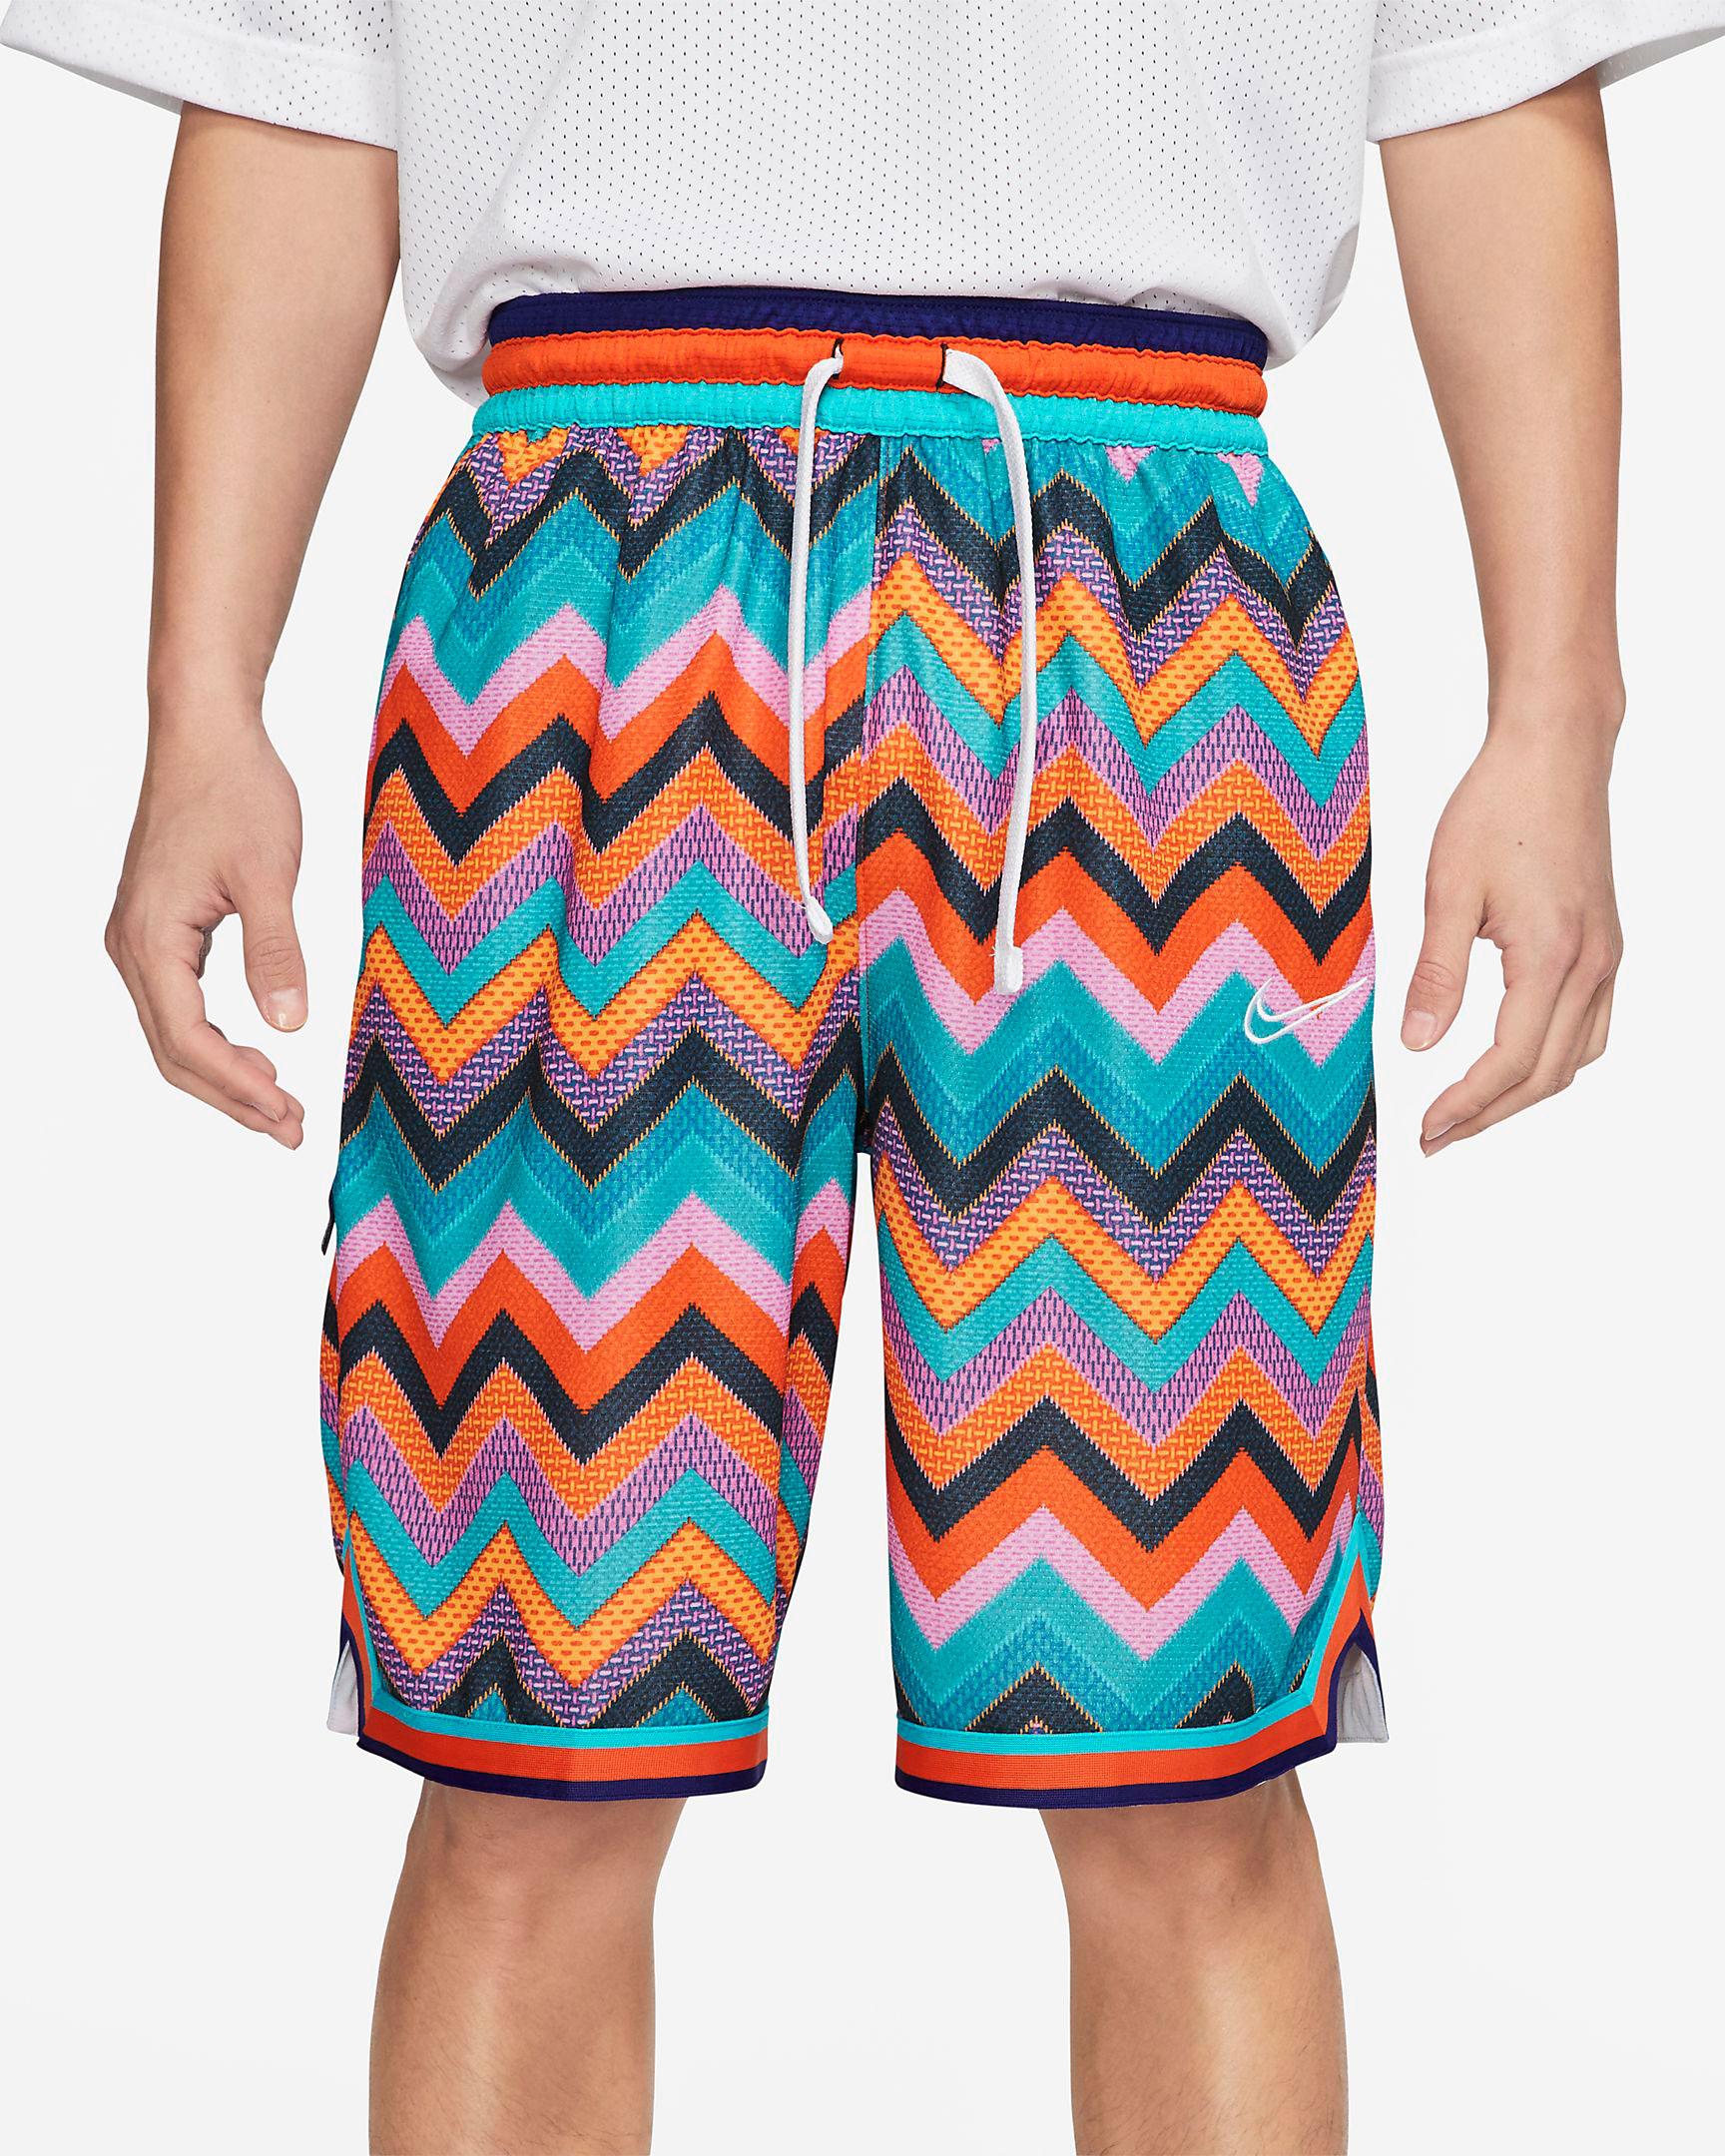 nike-foamposite-rugged-orange-shorts-match-1